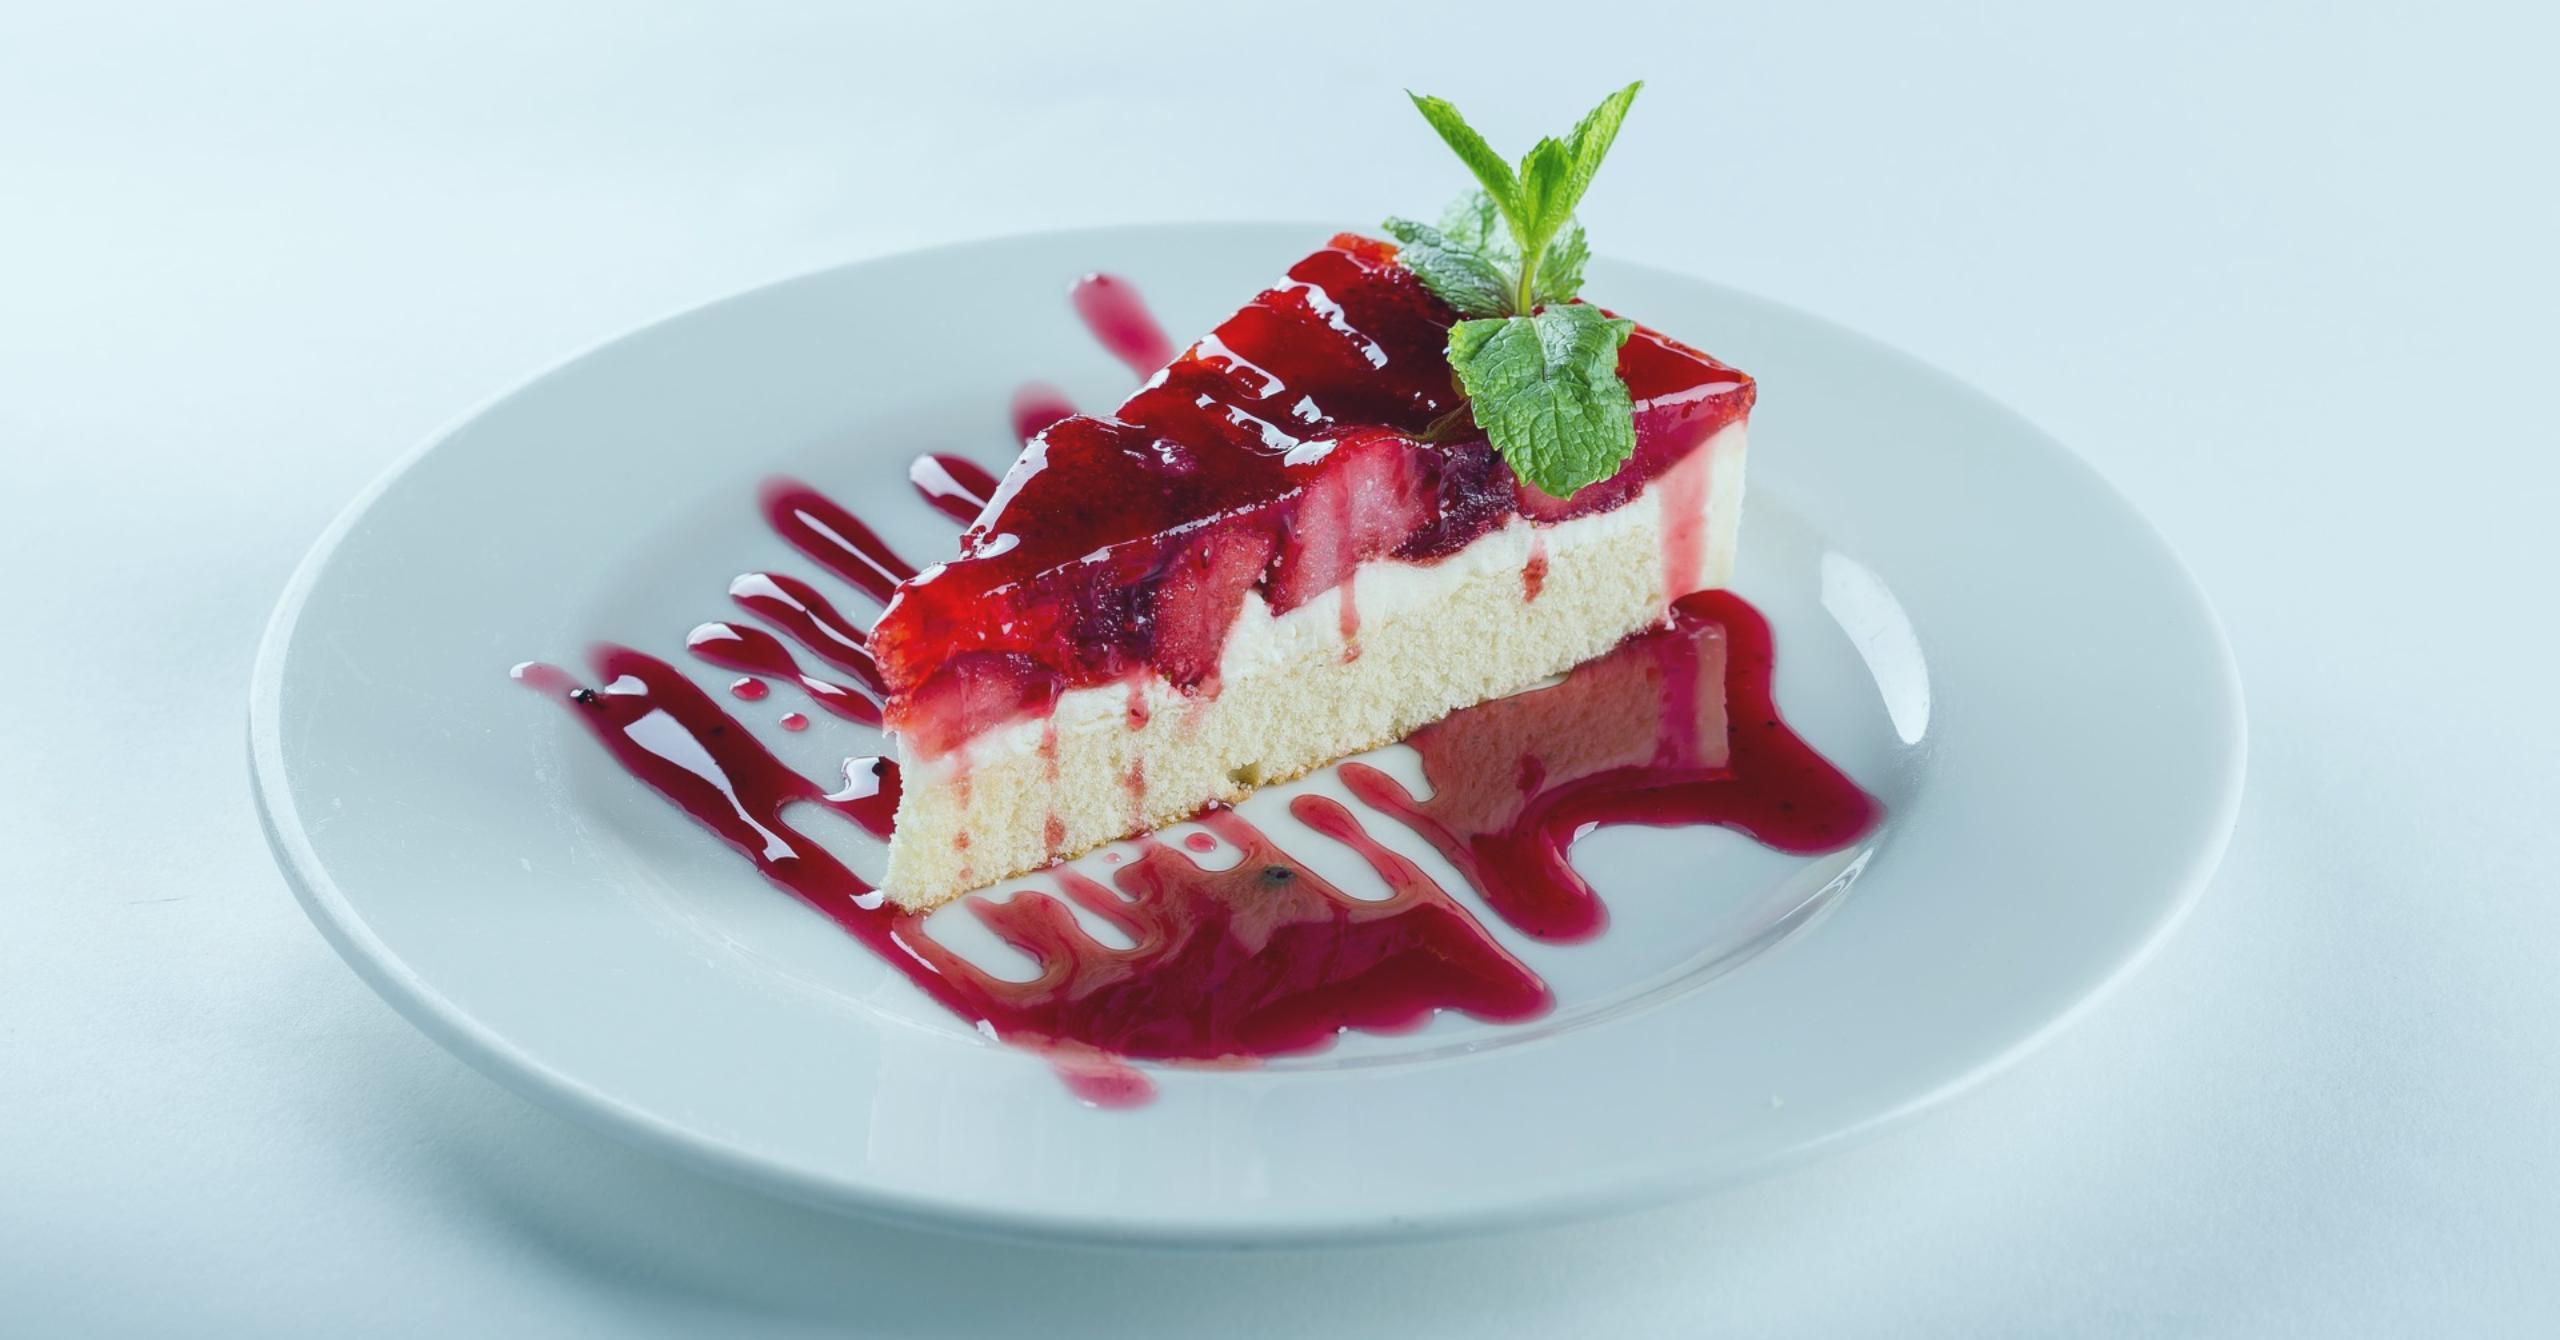 loystar-how-to-delight-customers-on-birthday